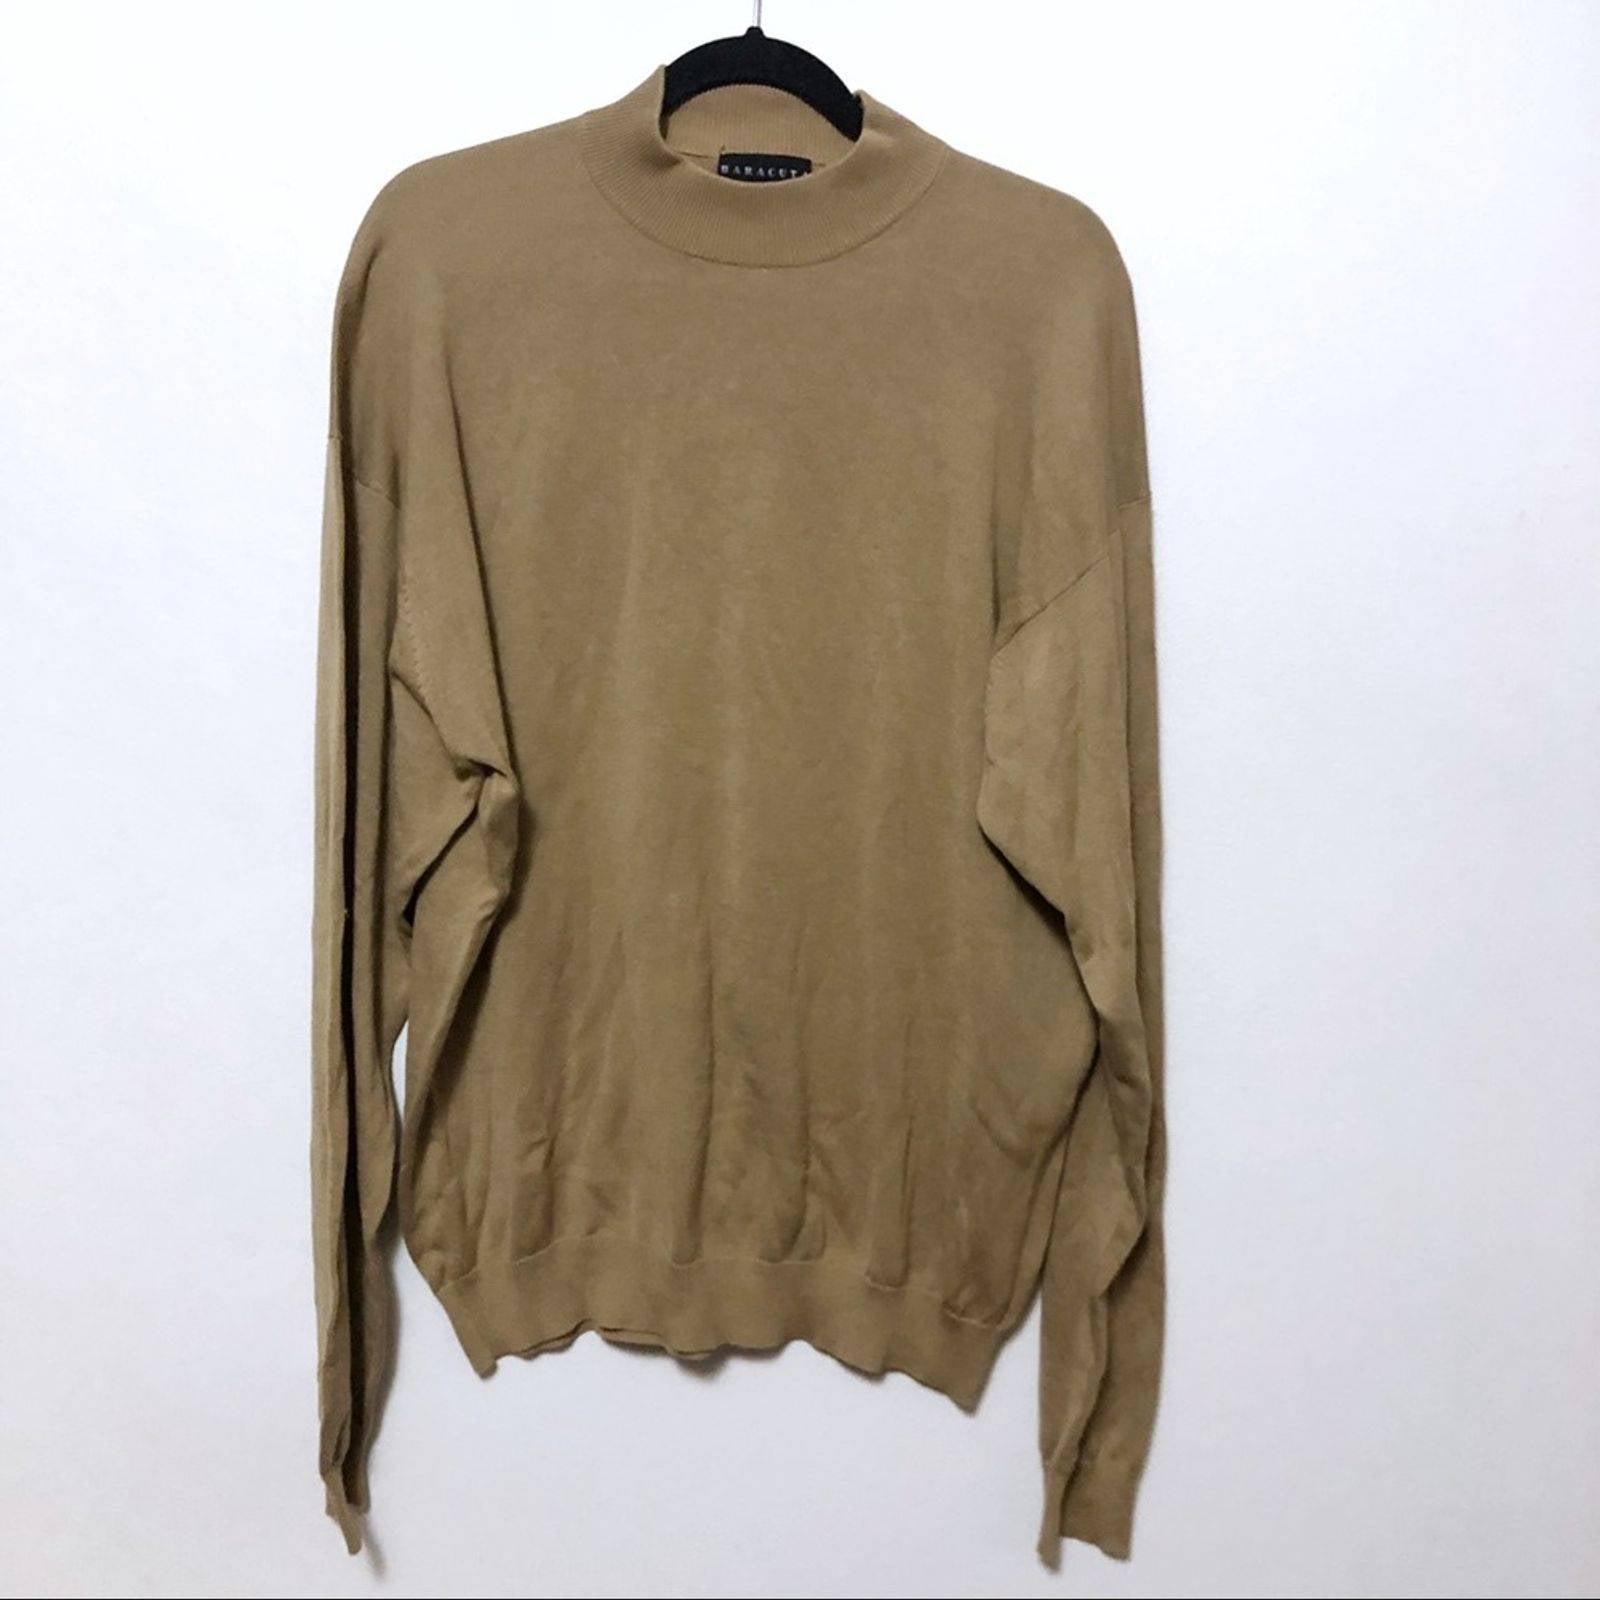 Baracuta tan mockneck sweater silk